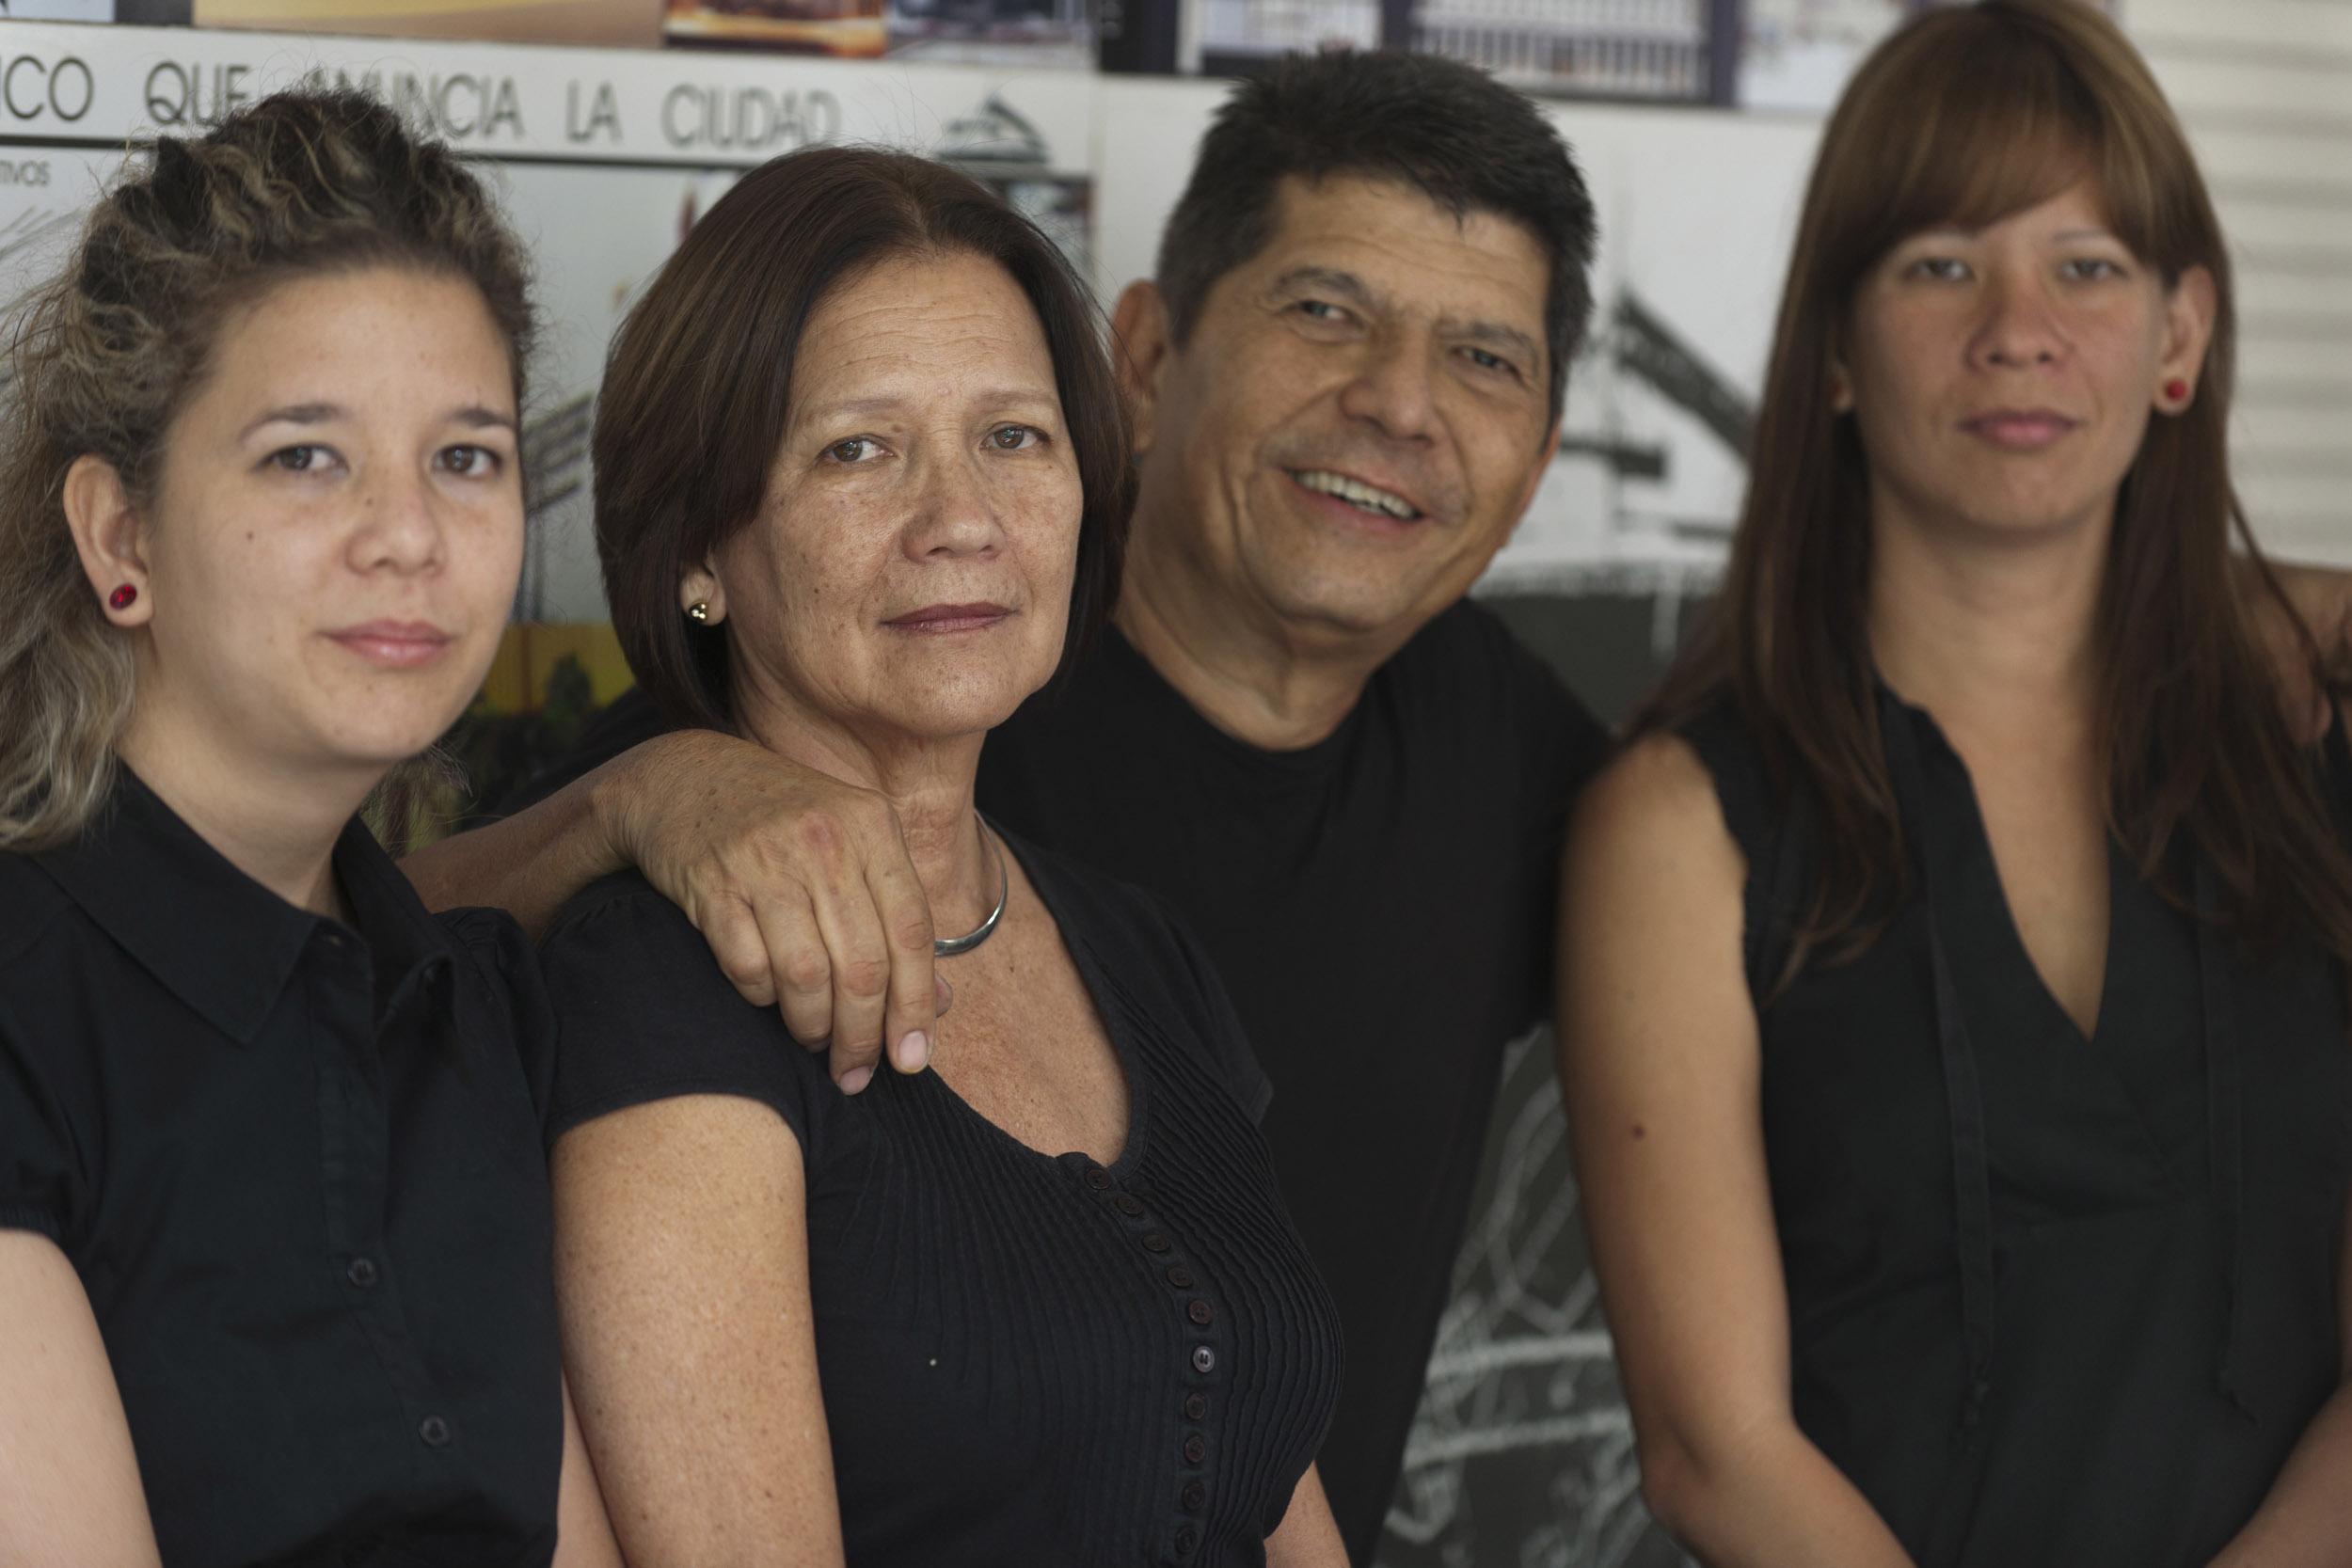 Choy's, architects - Illuminated Cuba - Hector Garrido, Aerial and human photography